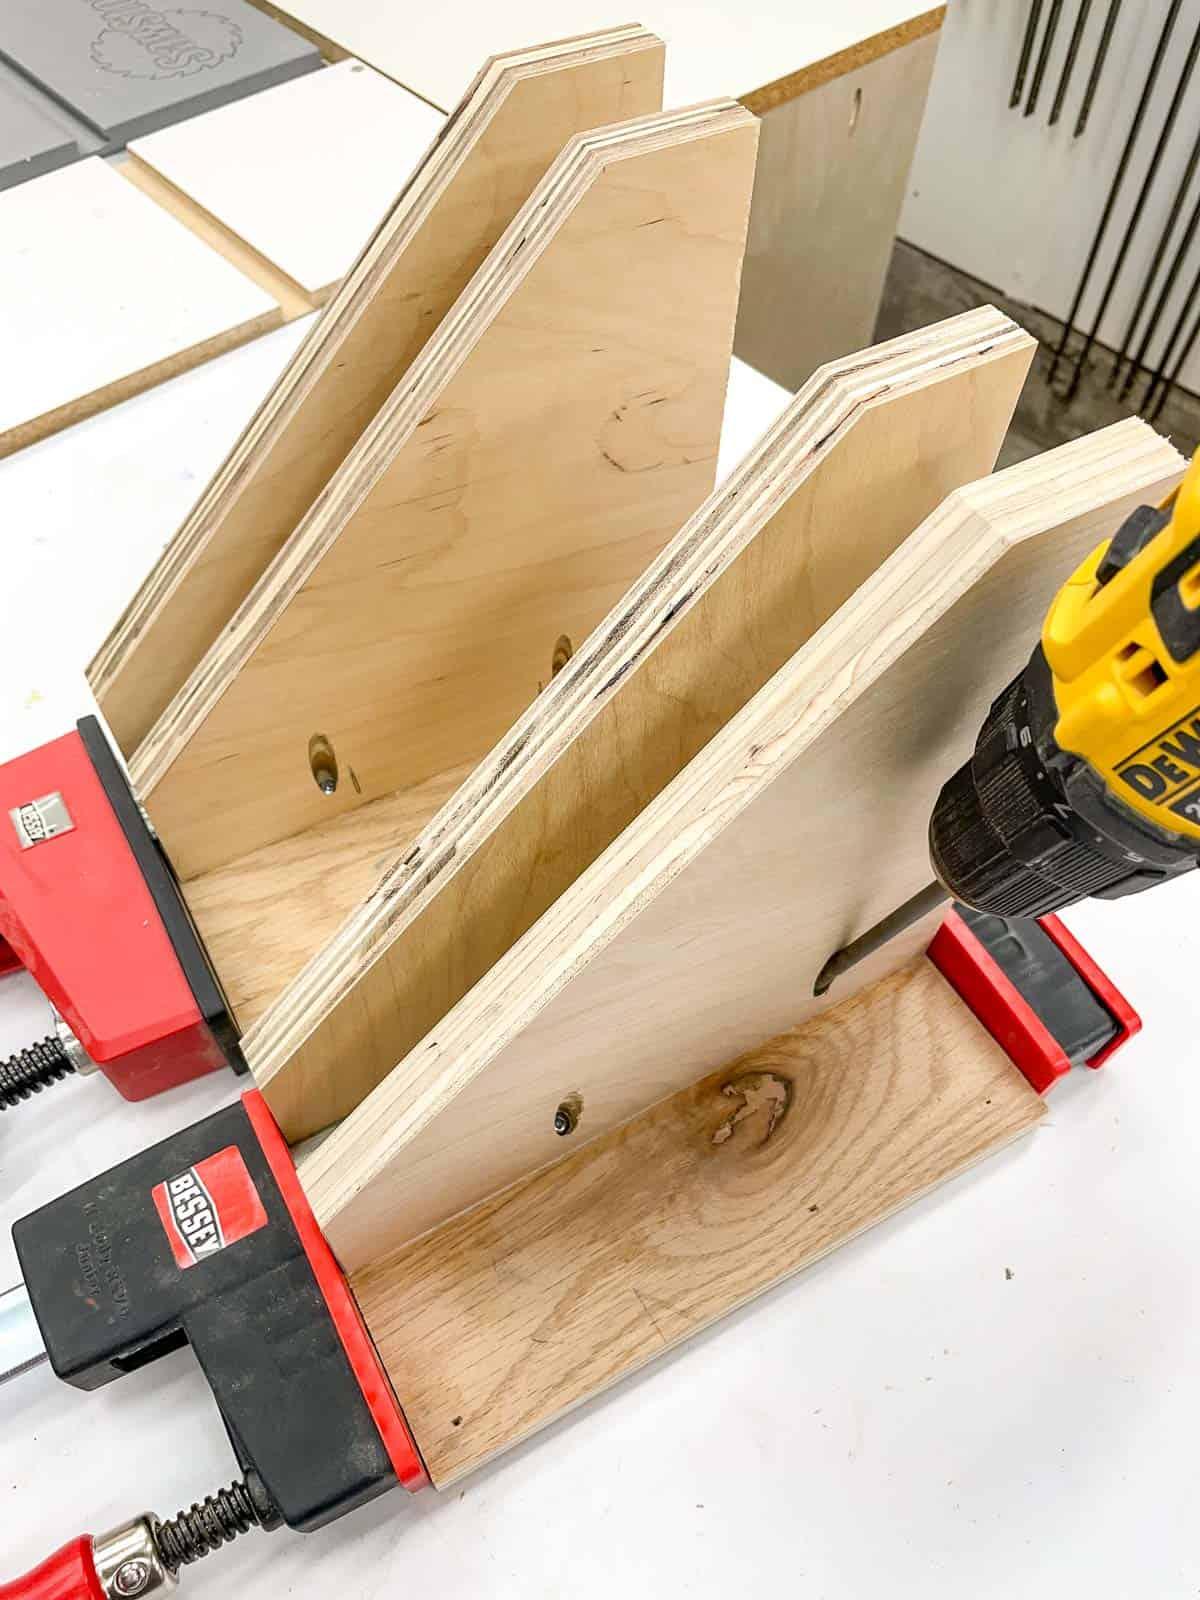 assembling DIY clamp rack with pocket hole screws